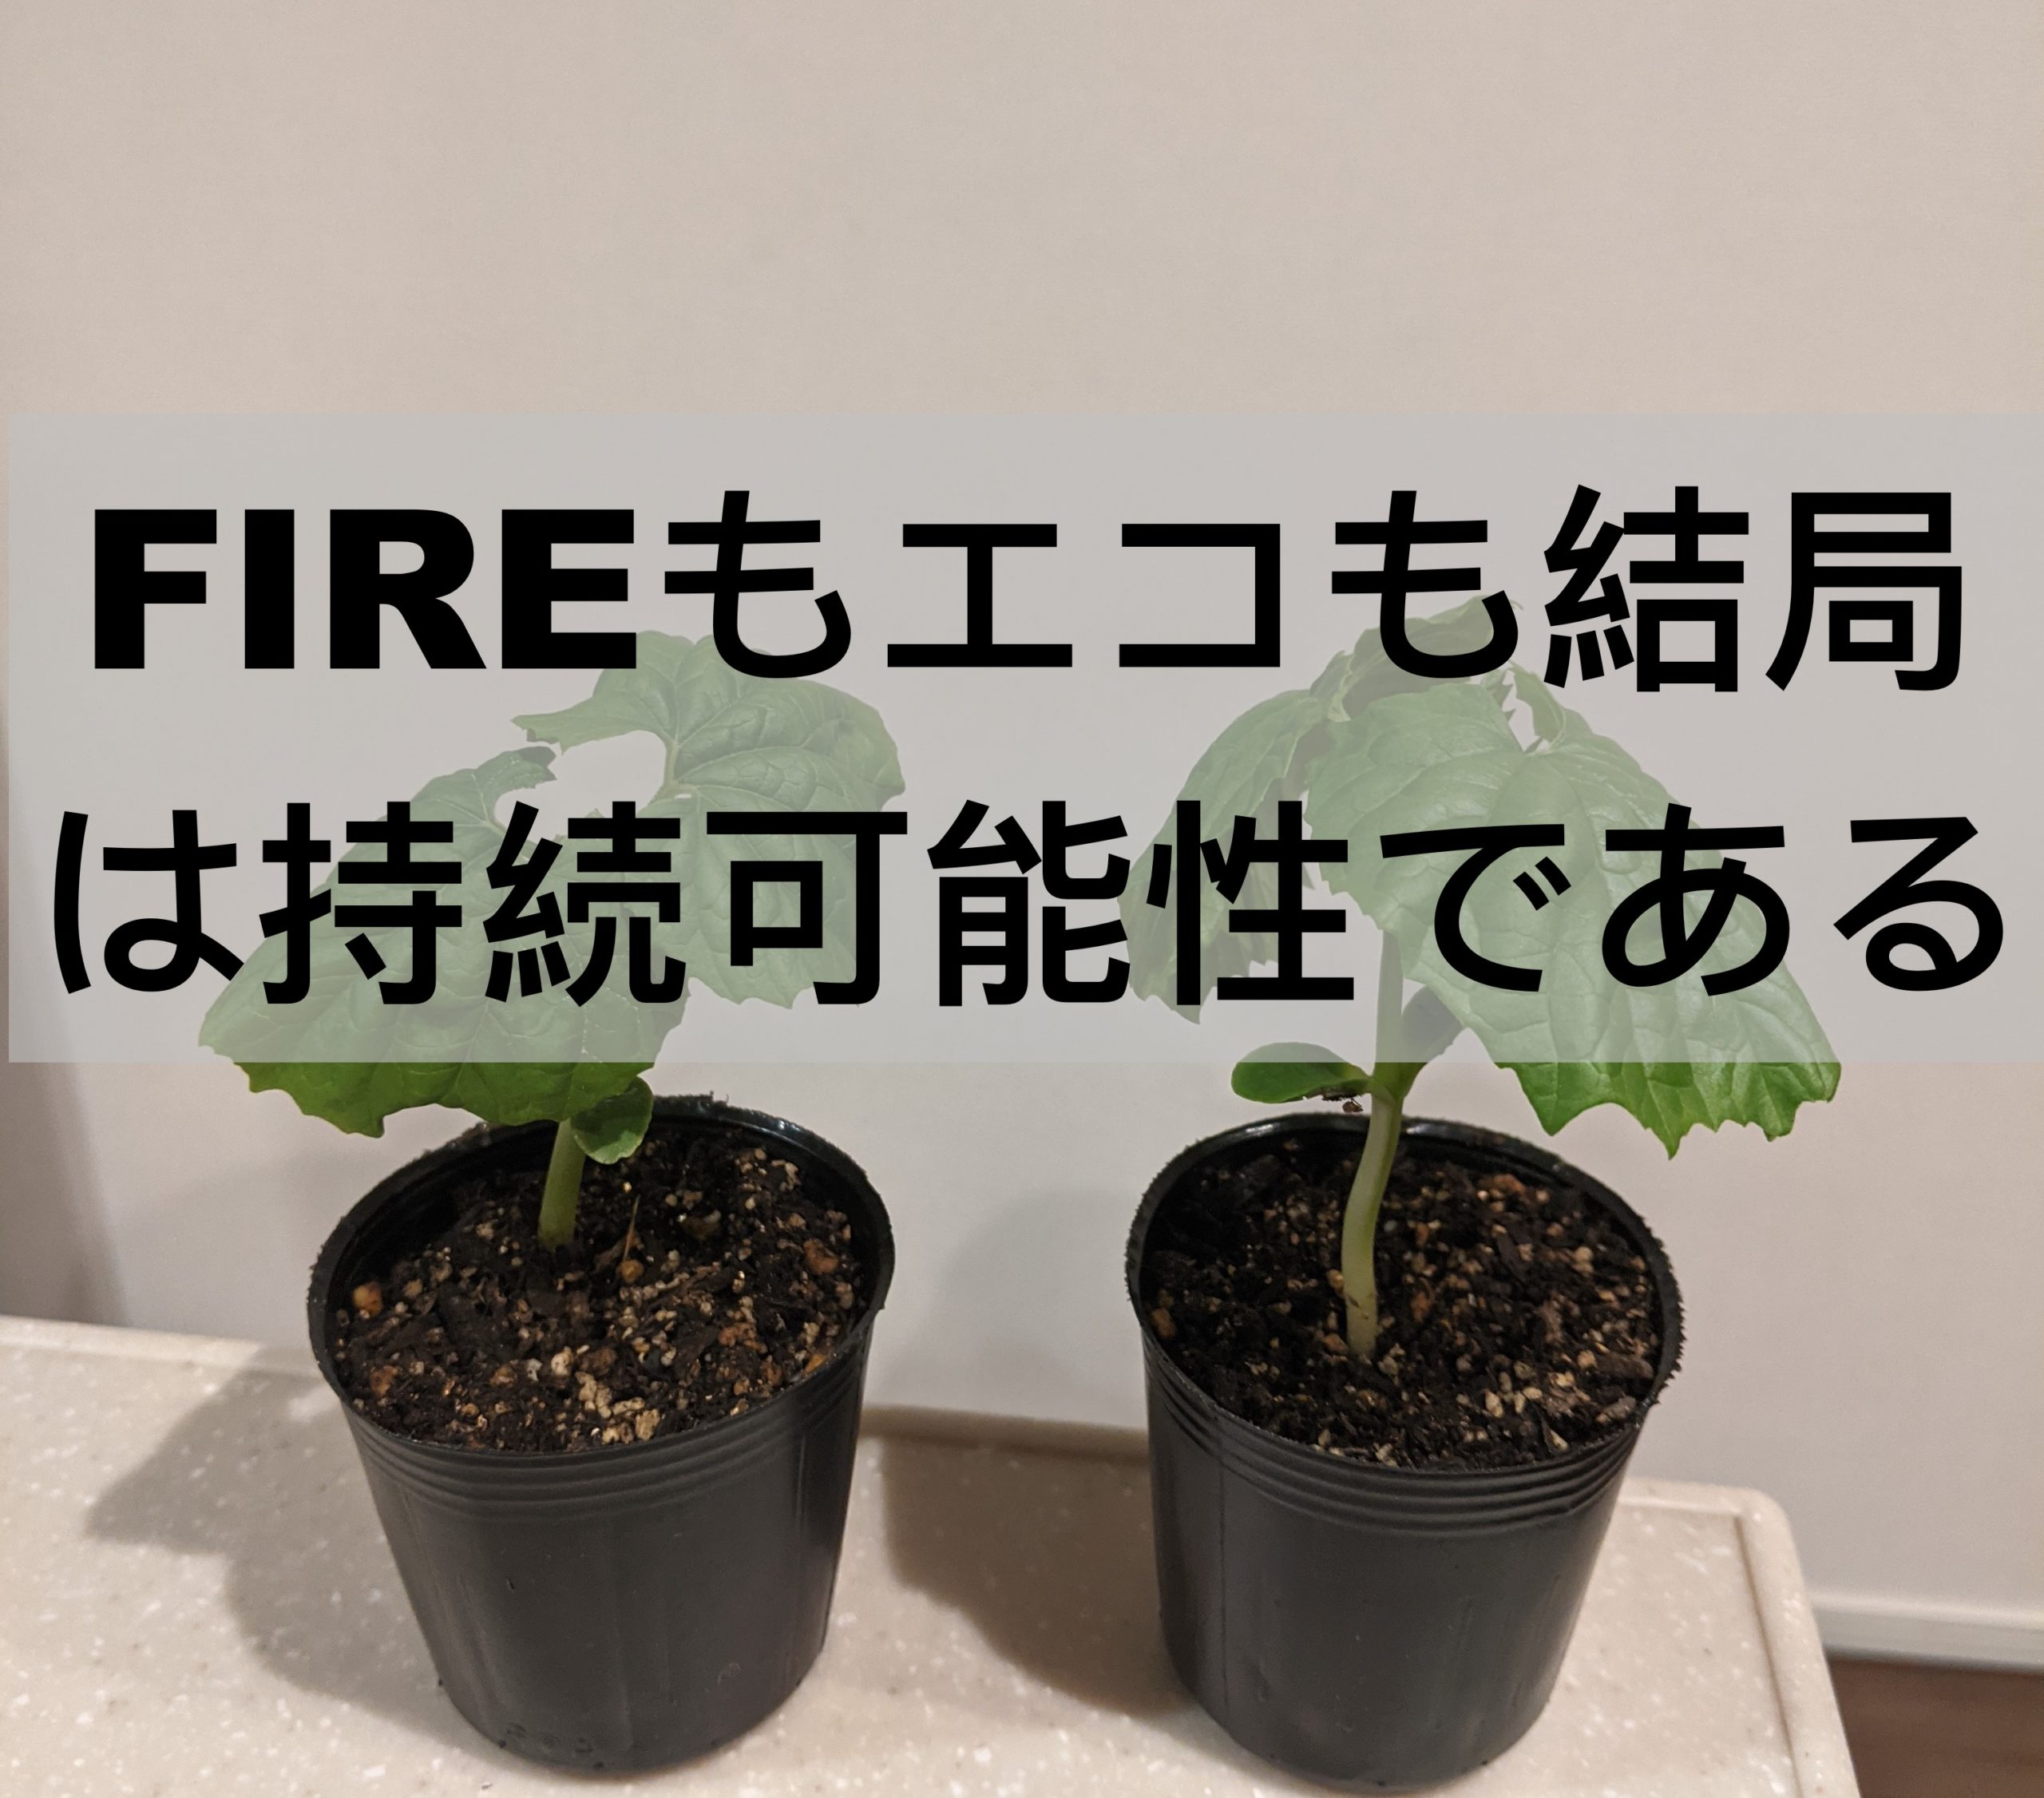 FIRE持続可能性